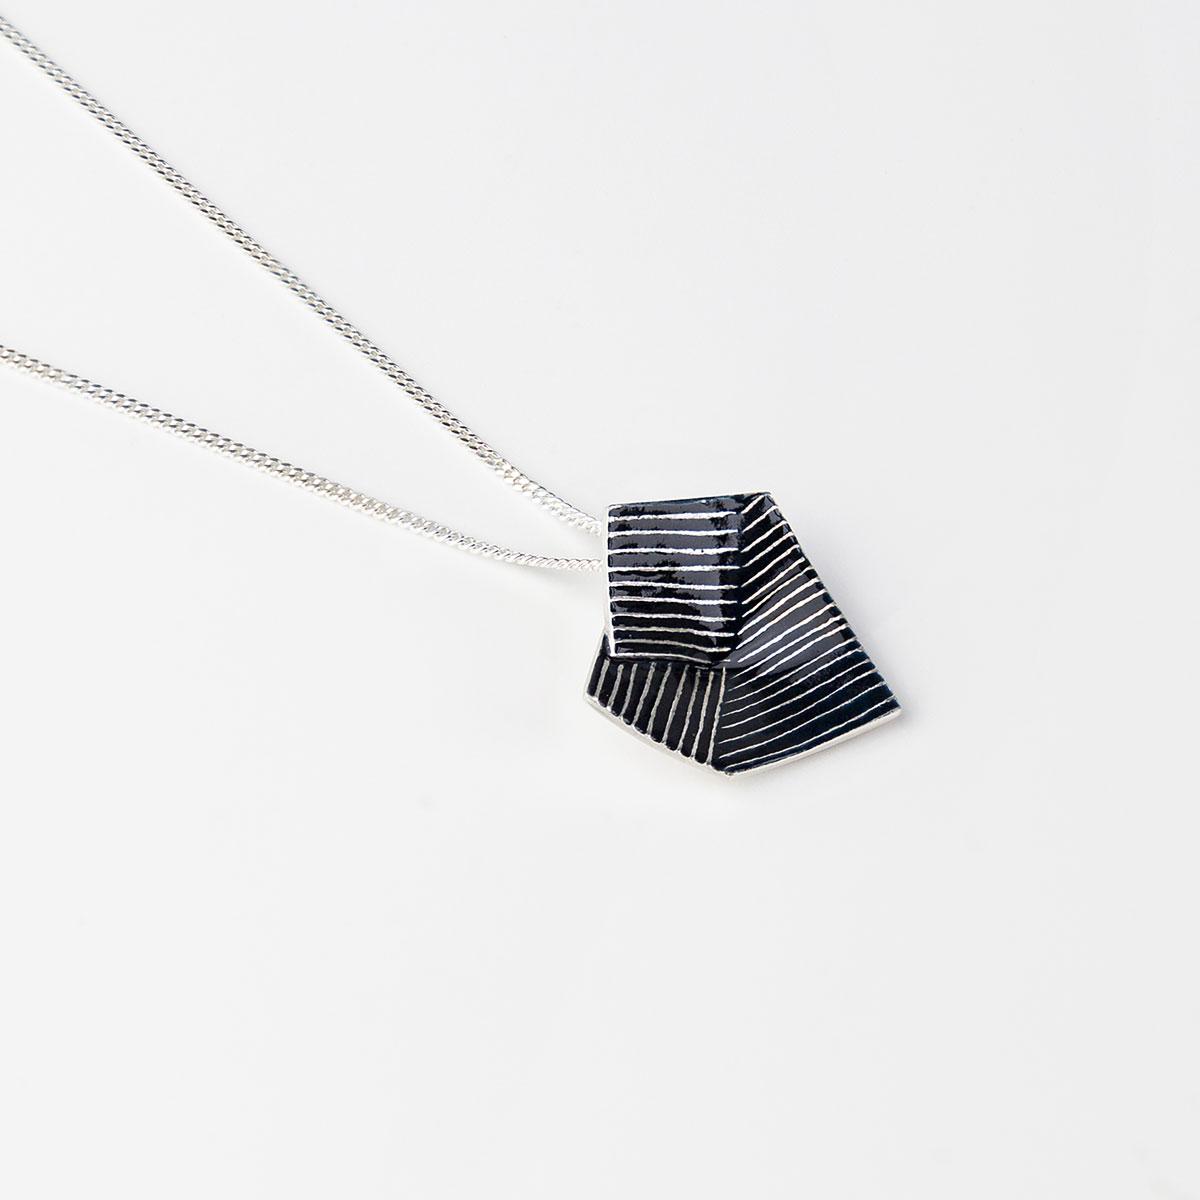 'Lines in Motion' Pendant (Black)